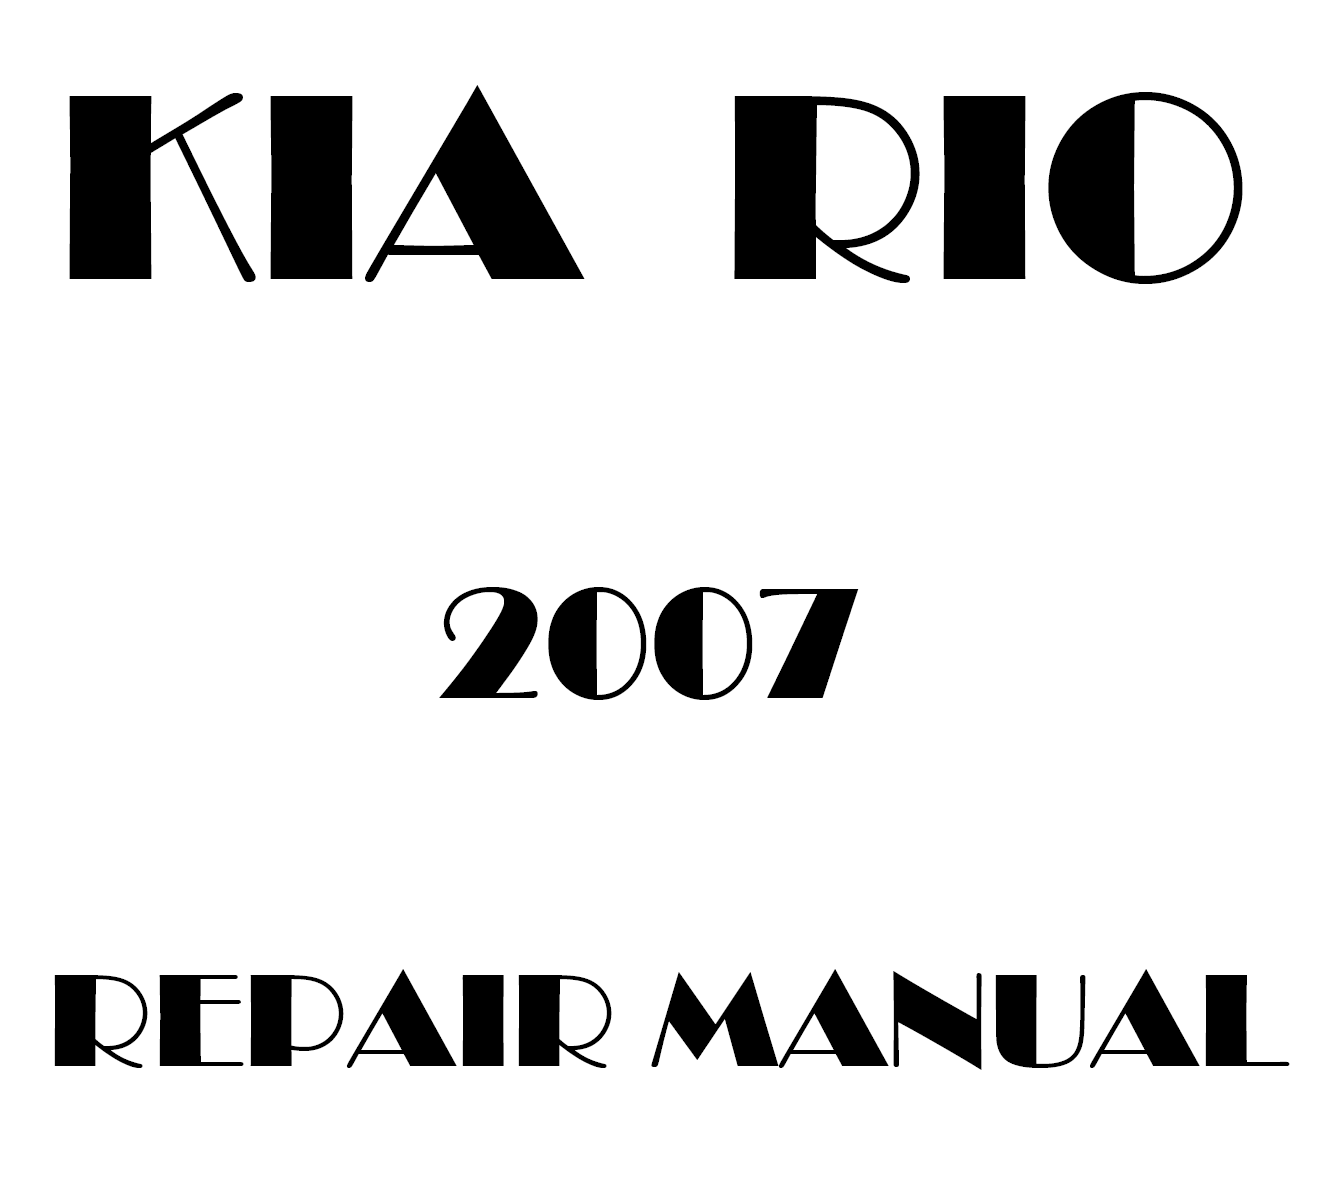 2007 Kia Rio repair manual